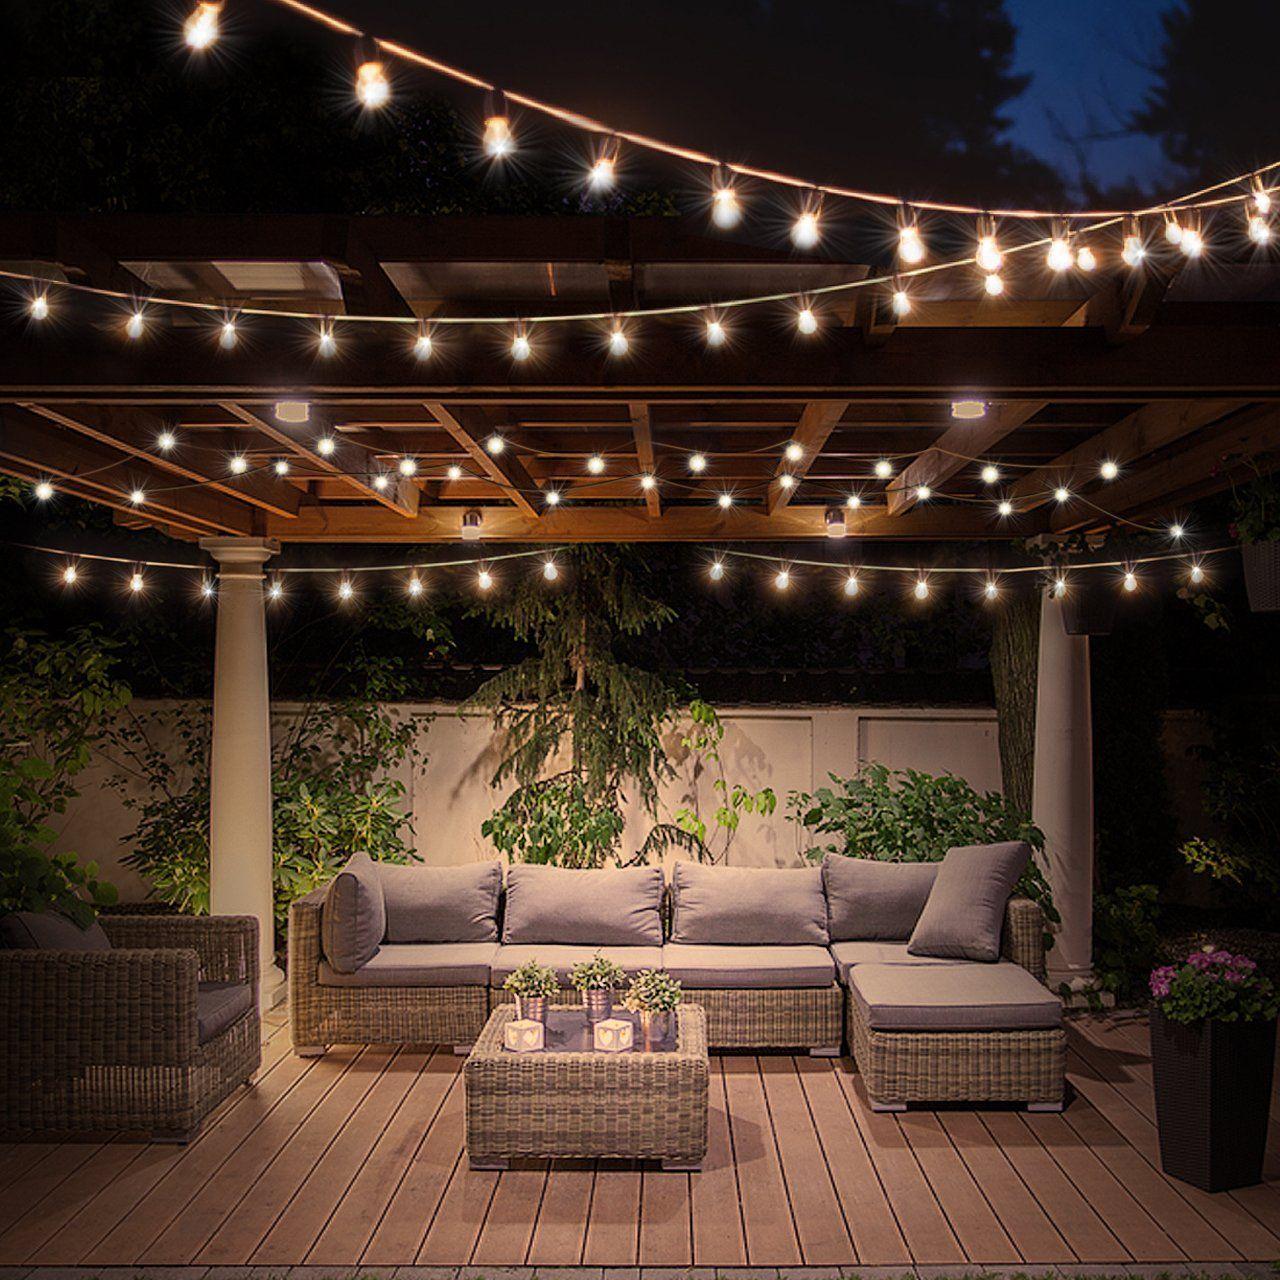 Light Clothesline With Vintage Lamp Clothesline Lamp Light Vintage Outdoor Patio Decor Backyard Patio Designs Patio Design